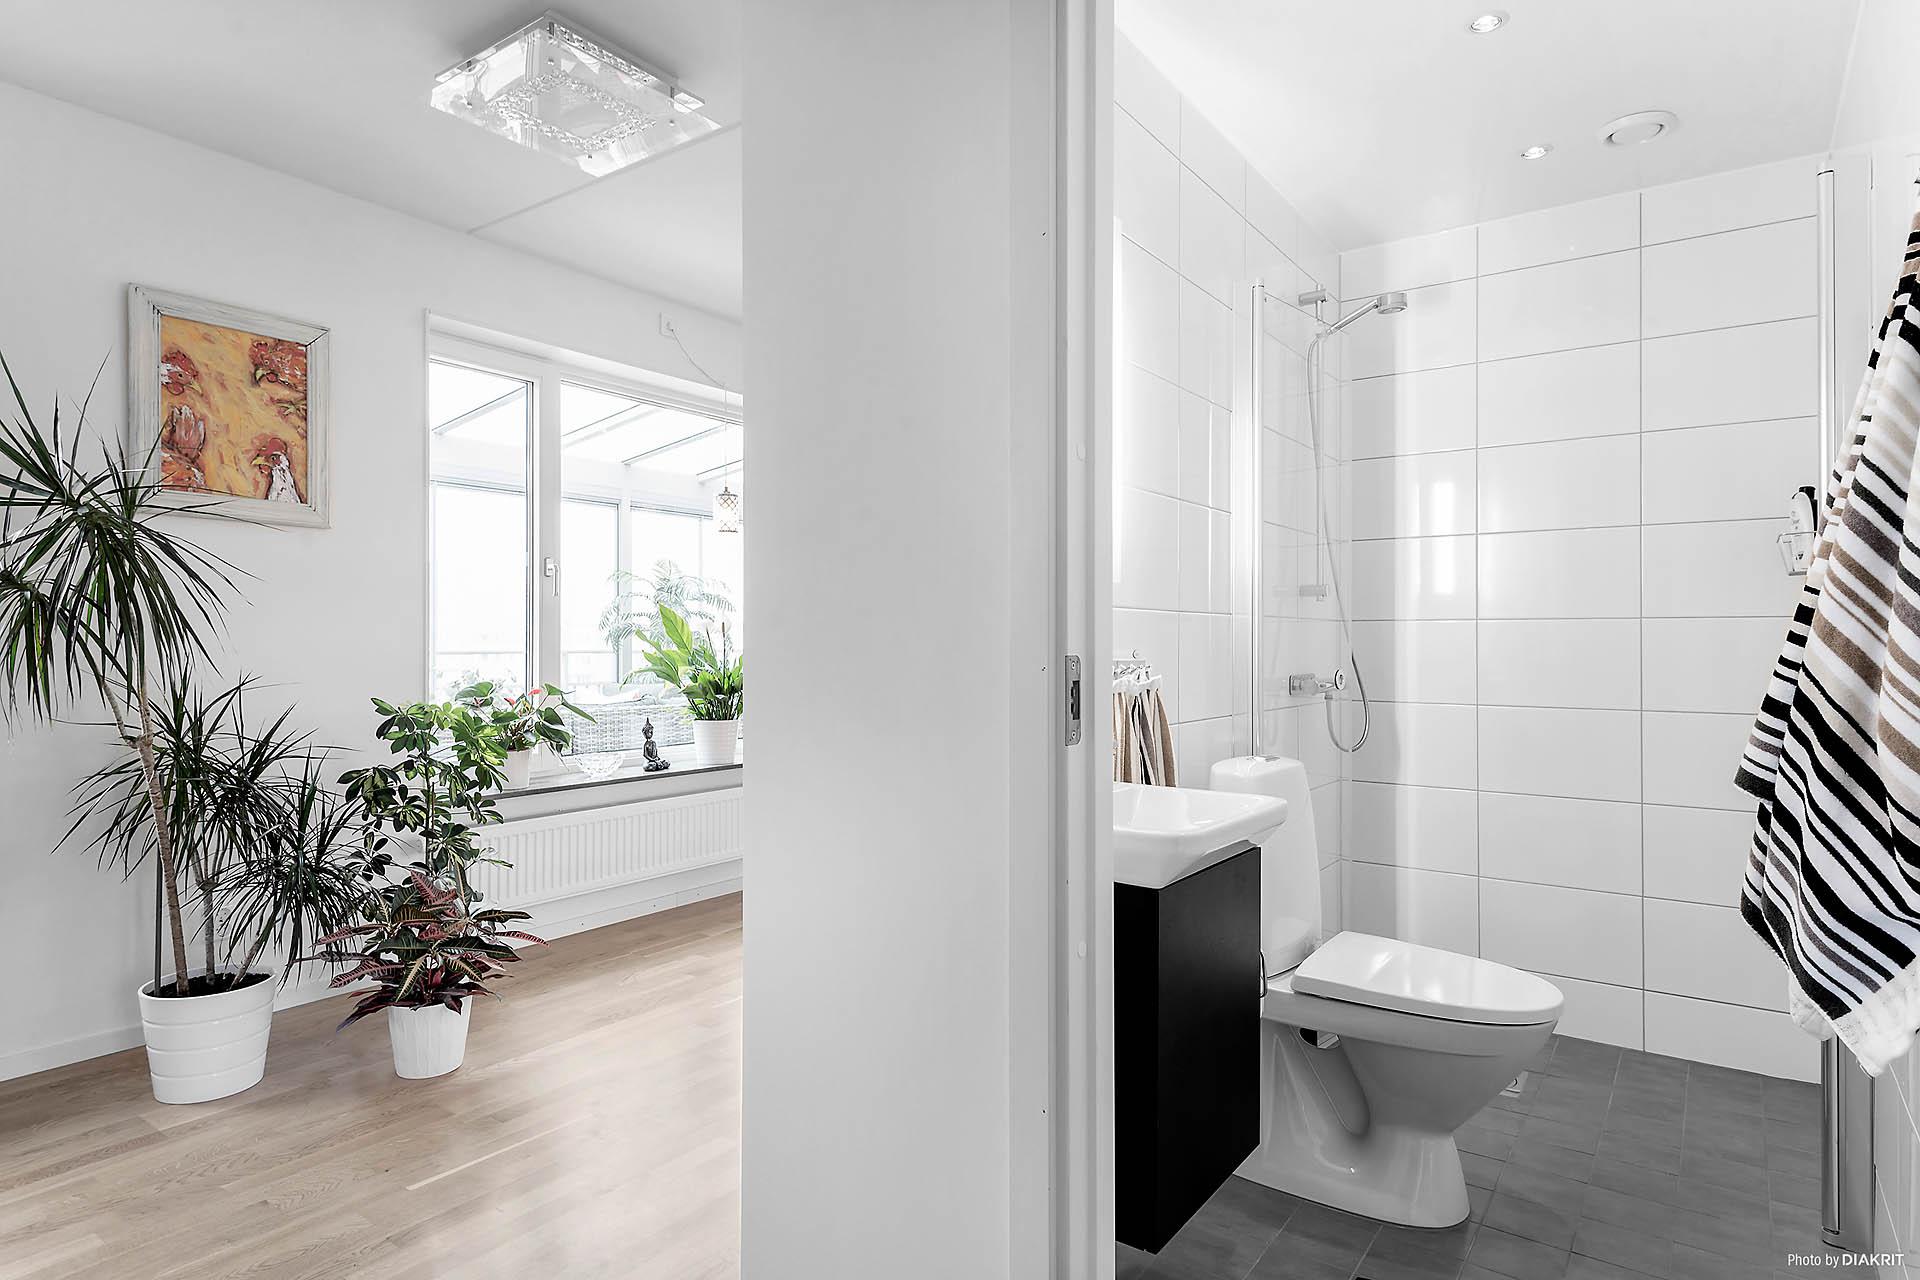 Lägenhetens ena badrum